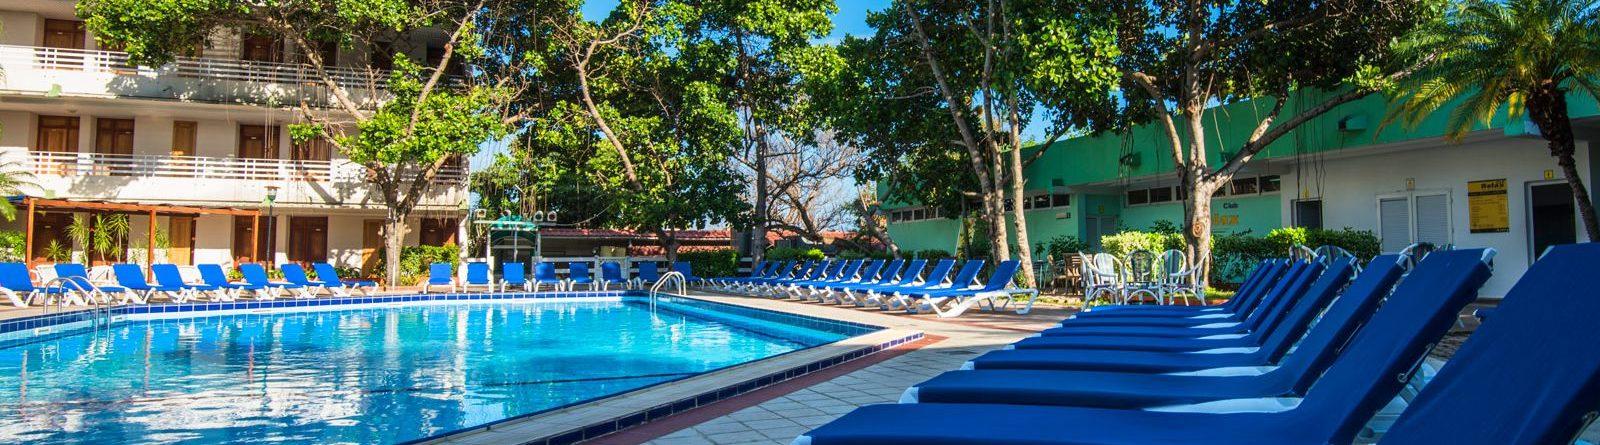 hotel-kohly-habana